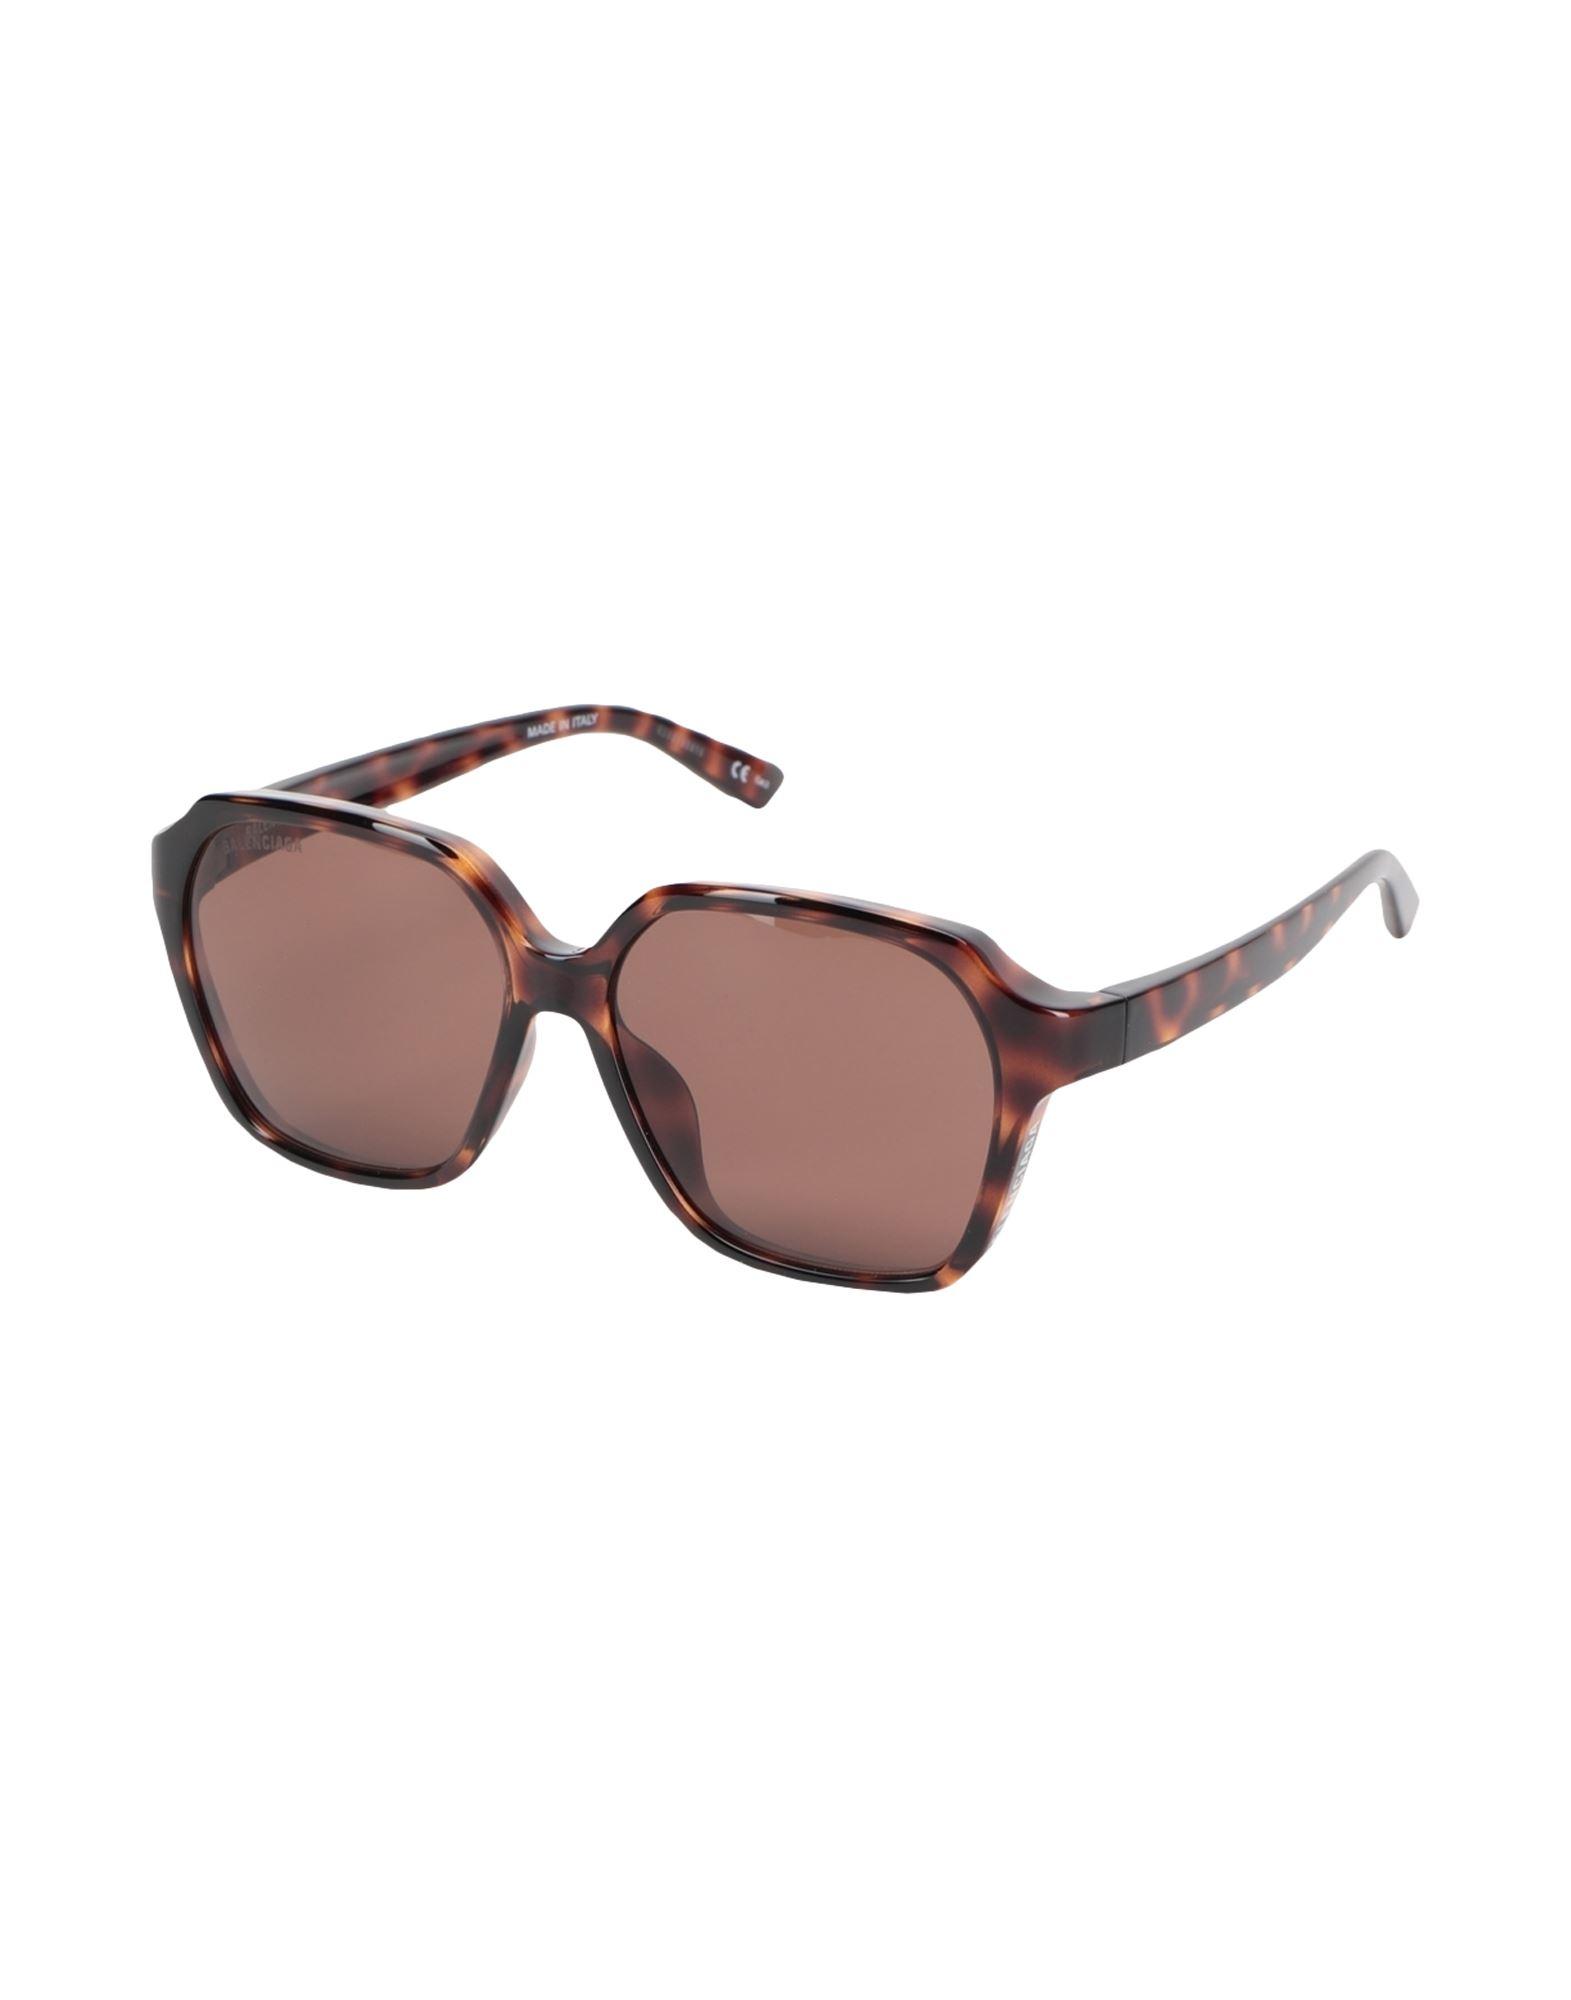 BALENCIAGA Sunglasses - Item 46756899